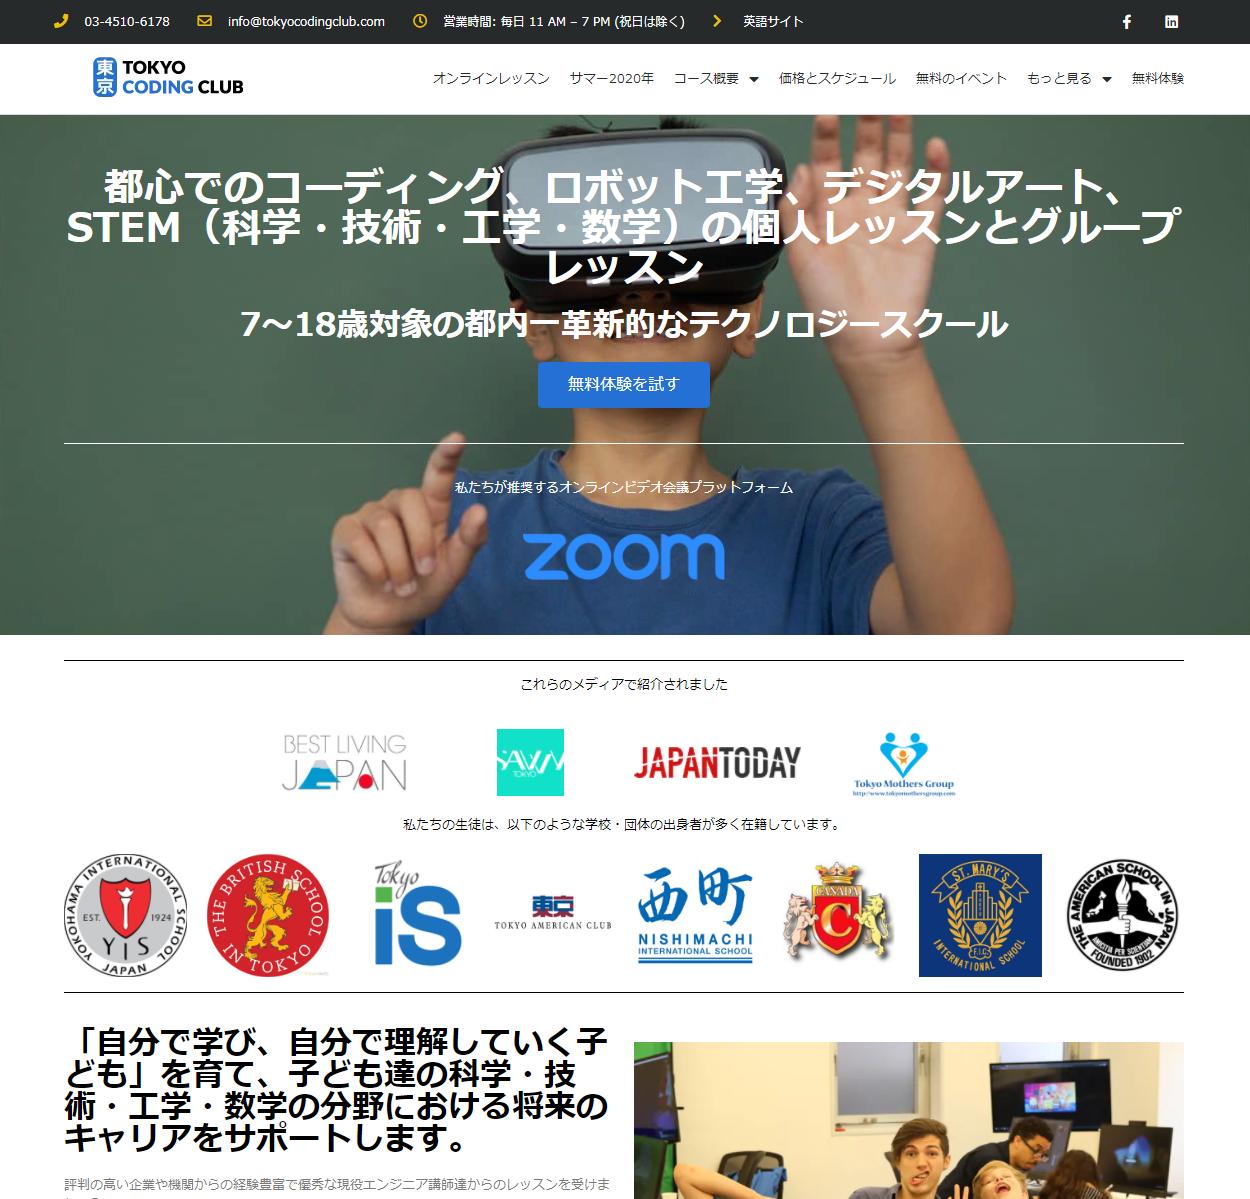 "<span class=""title"">東京コーディングクラブの口コミや評判</span>"